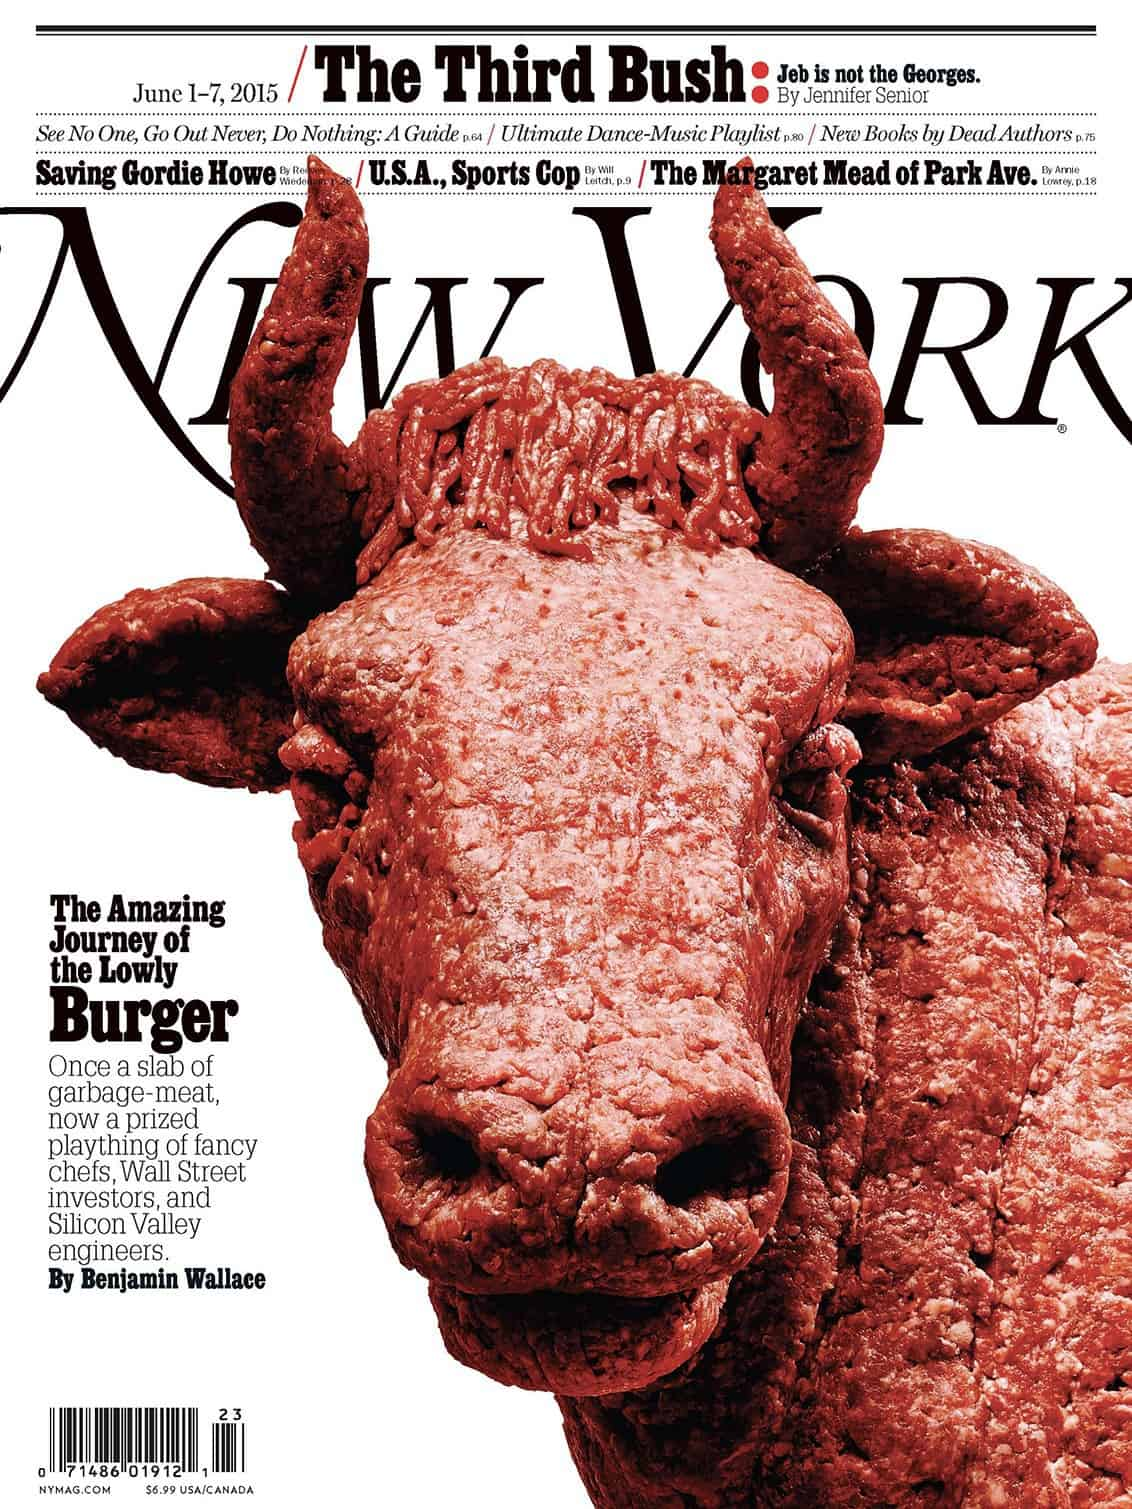 Jody Quon Magazine Cover Designs for New York Magazine – Burger Meat Bull Sculpture